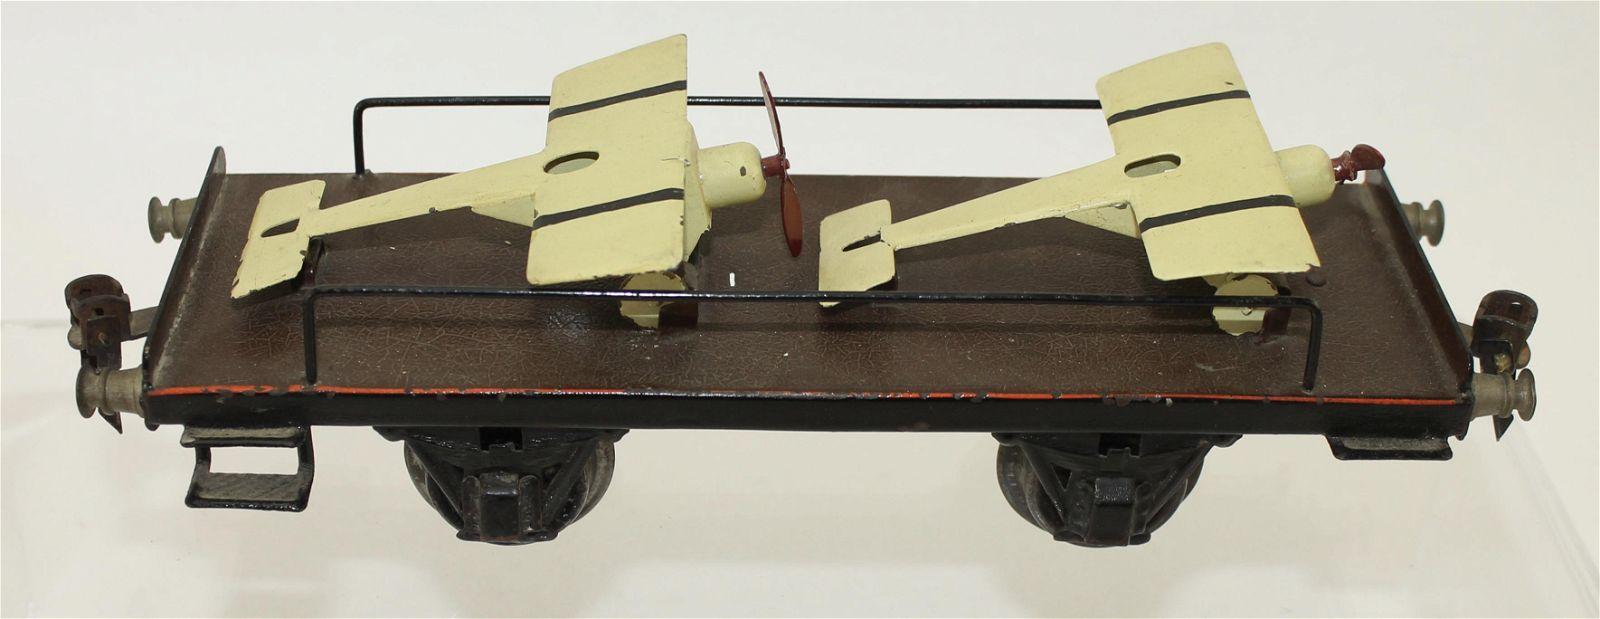 Marklin Gauge I Airplane Transport Wagon